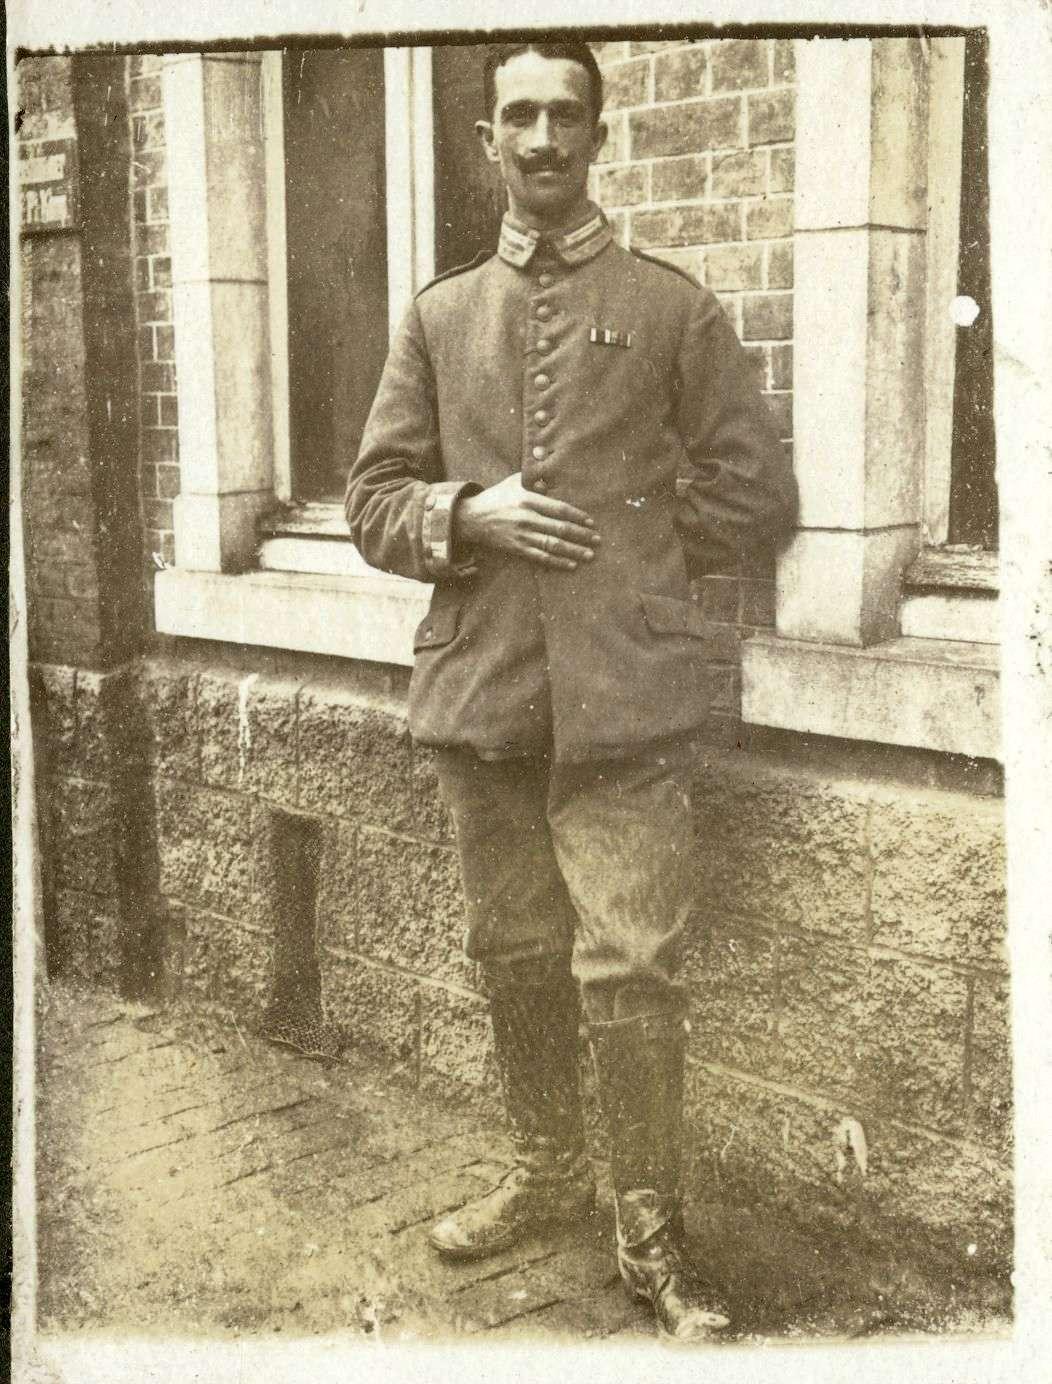 Hamma, Franz Paul, Bild 1